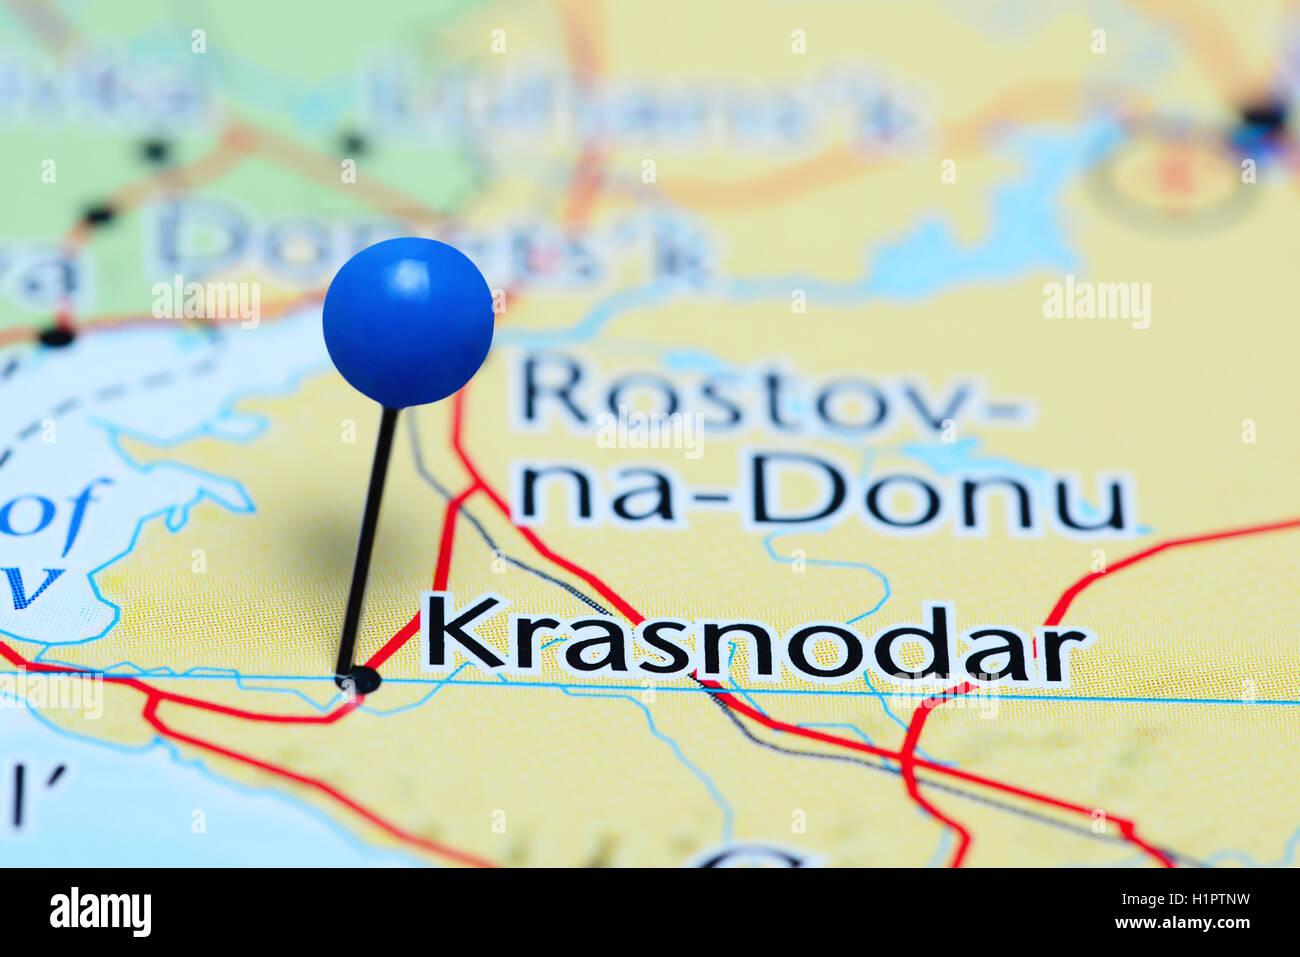 Krasnodar pinned on a map of Russia Stock Photo 121589605 Alamy